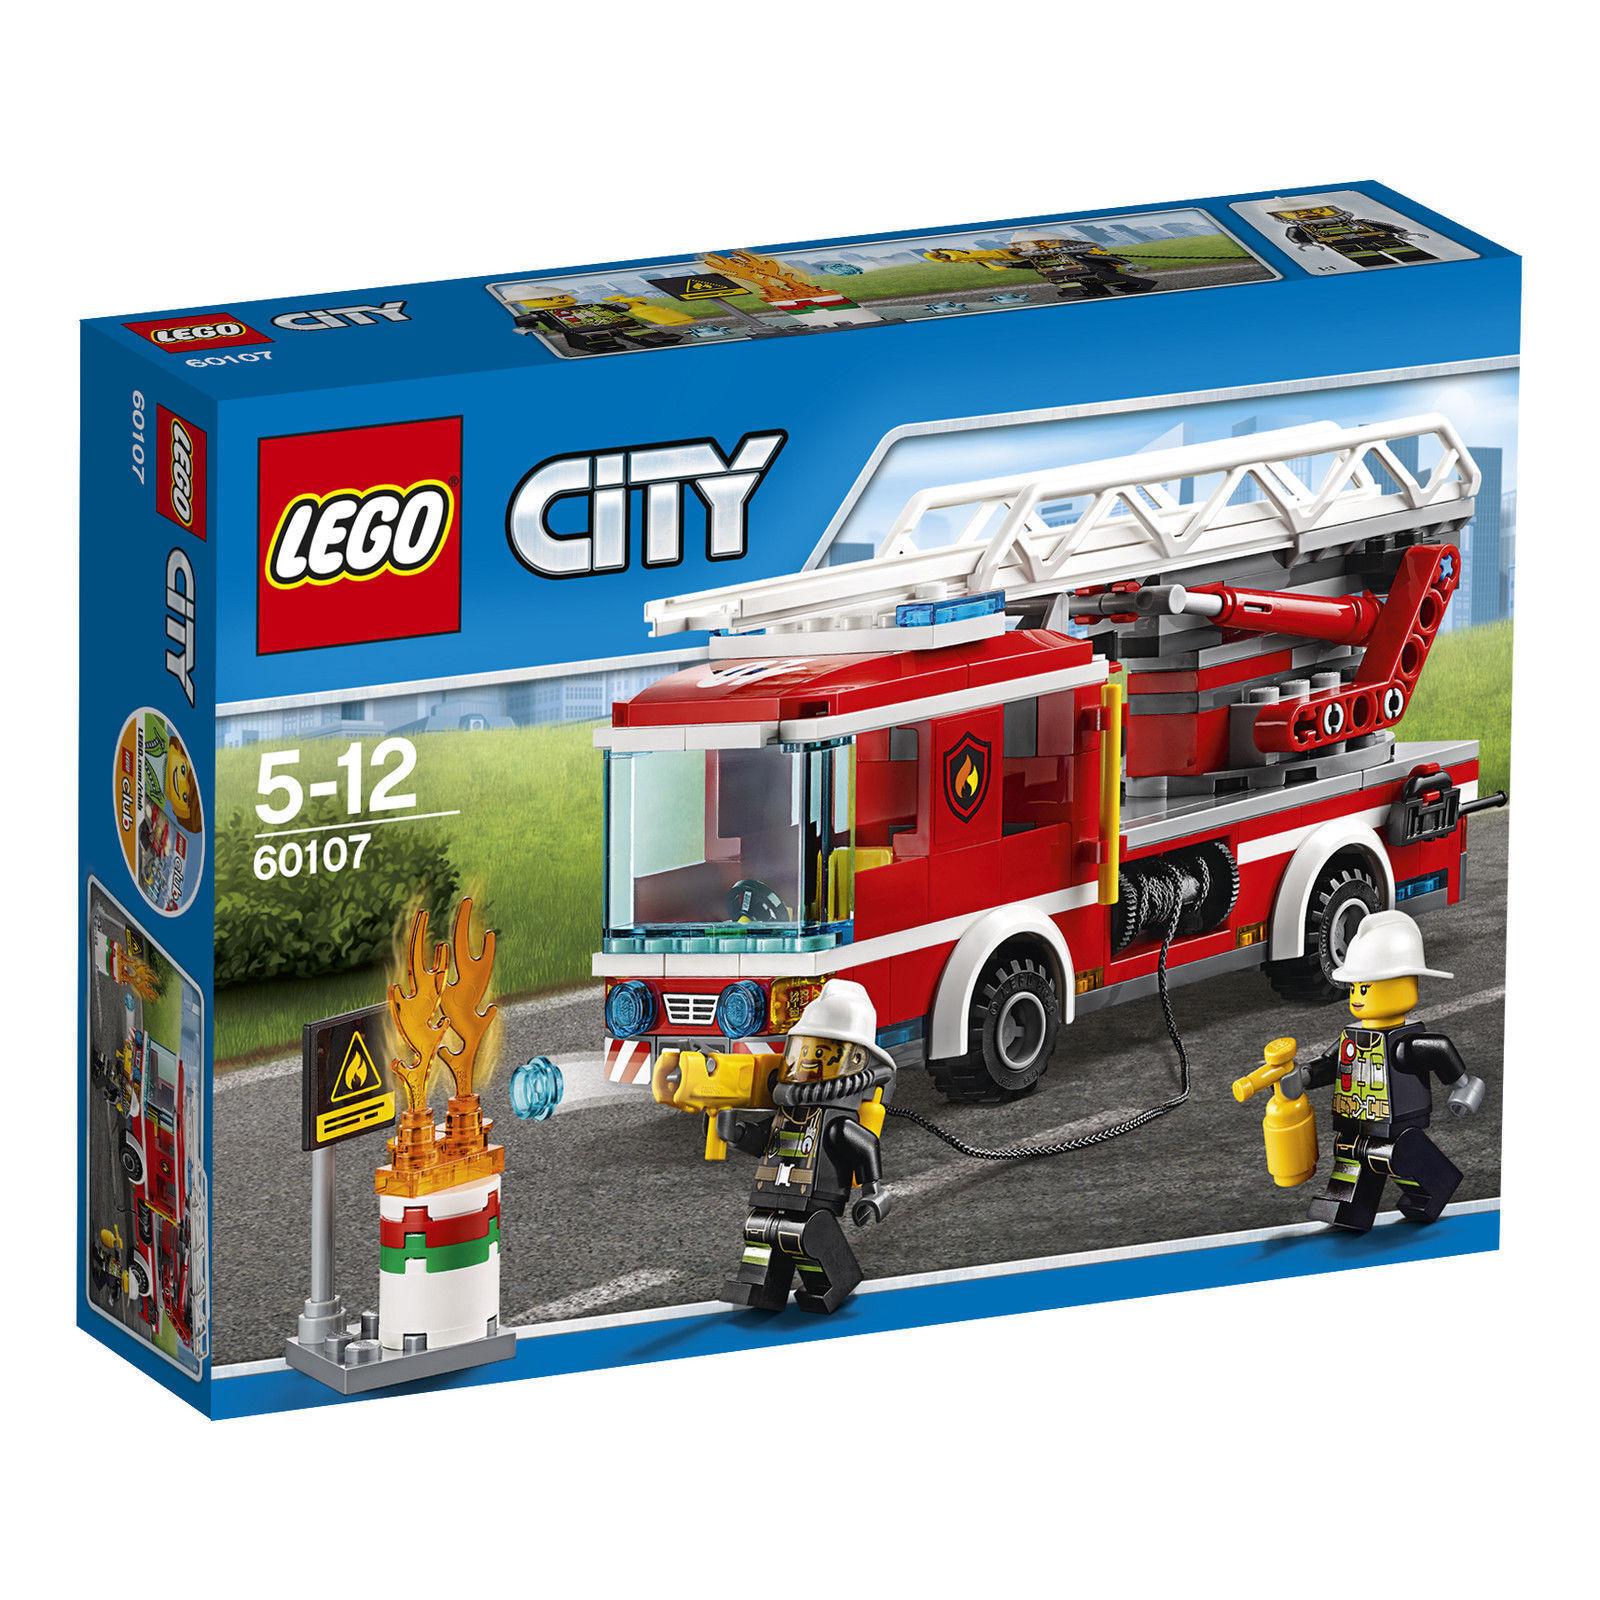 LEGO City 60107 Feuerwehrfahrzeug mit fahrbarer Leiter - NEU   OVP